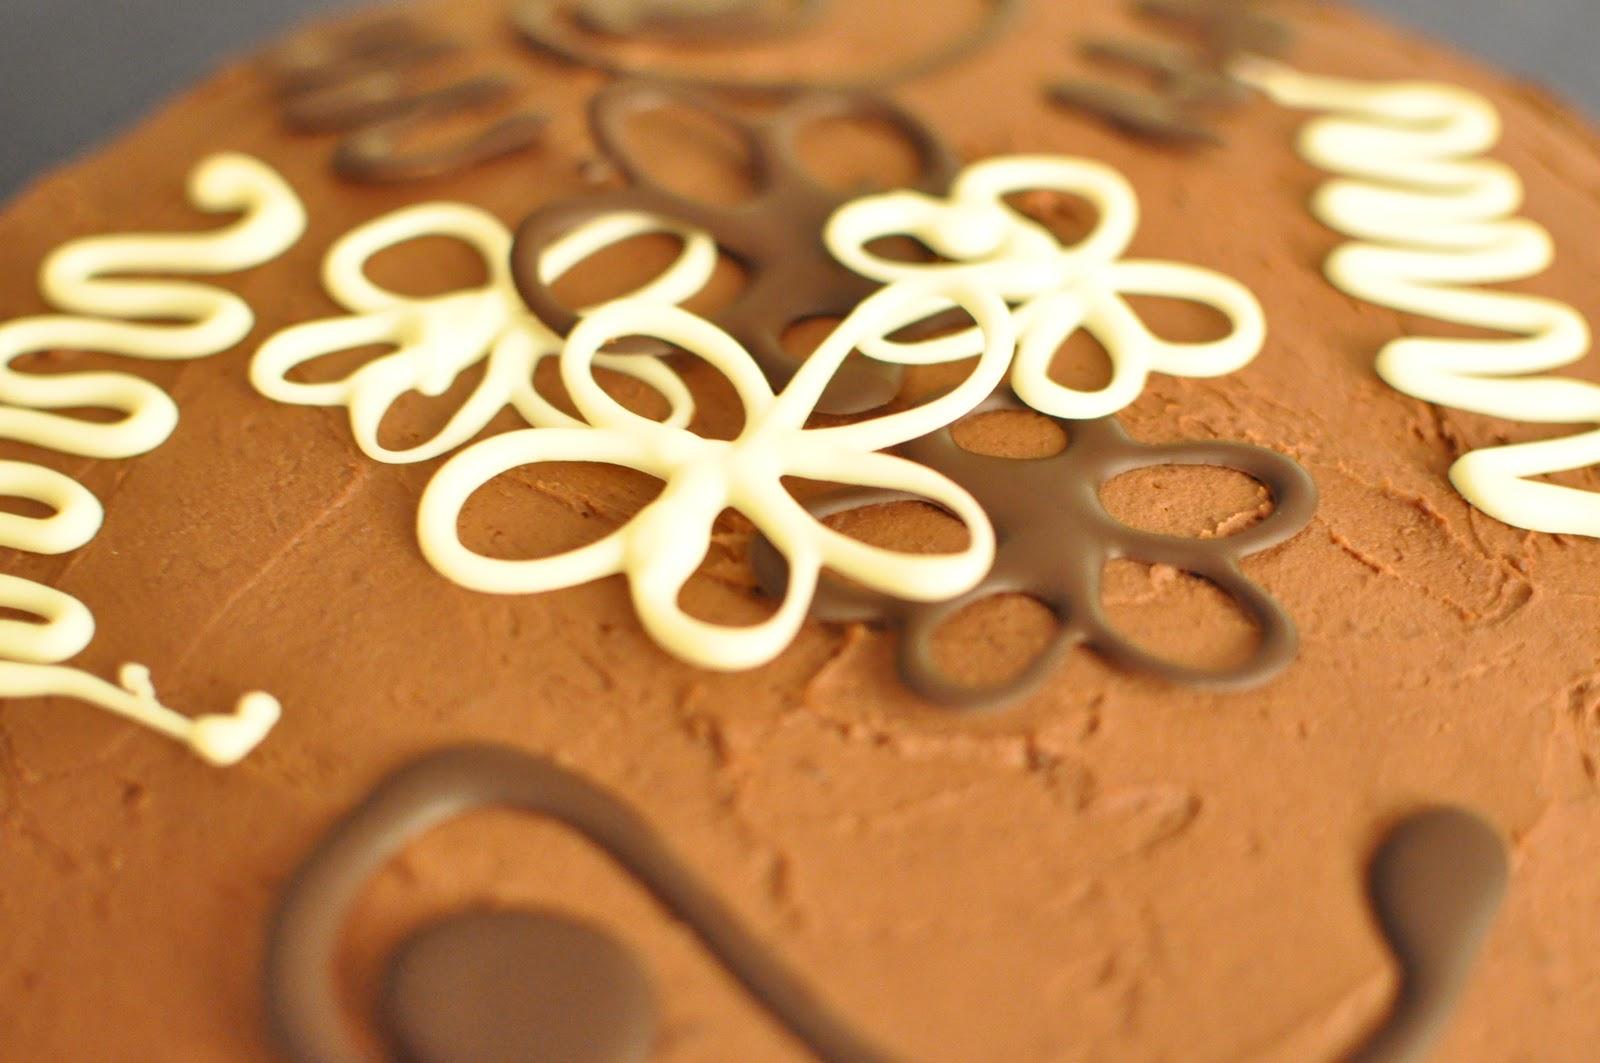 chokladdekoration steg för steg